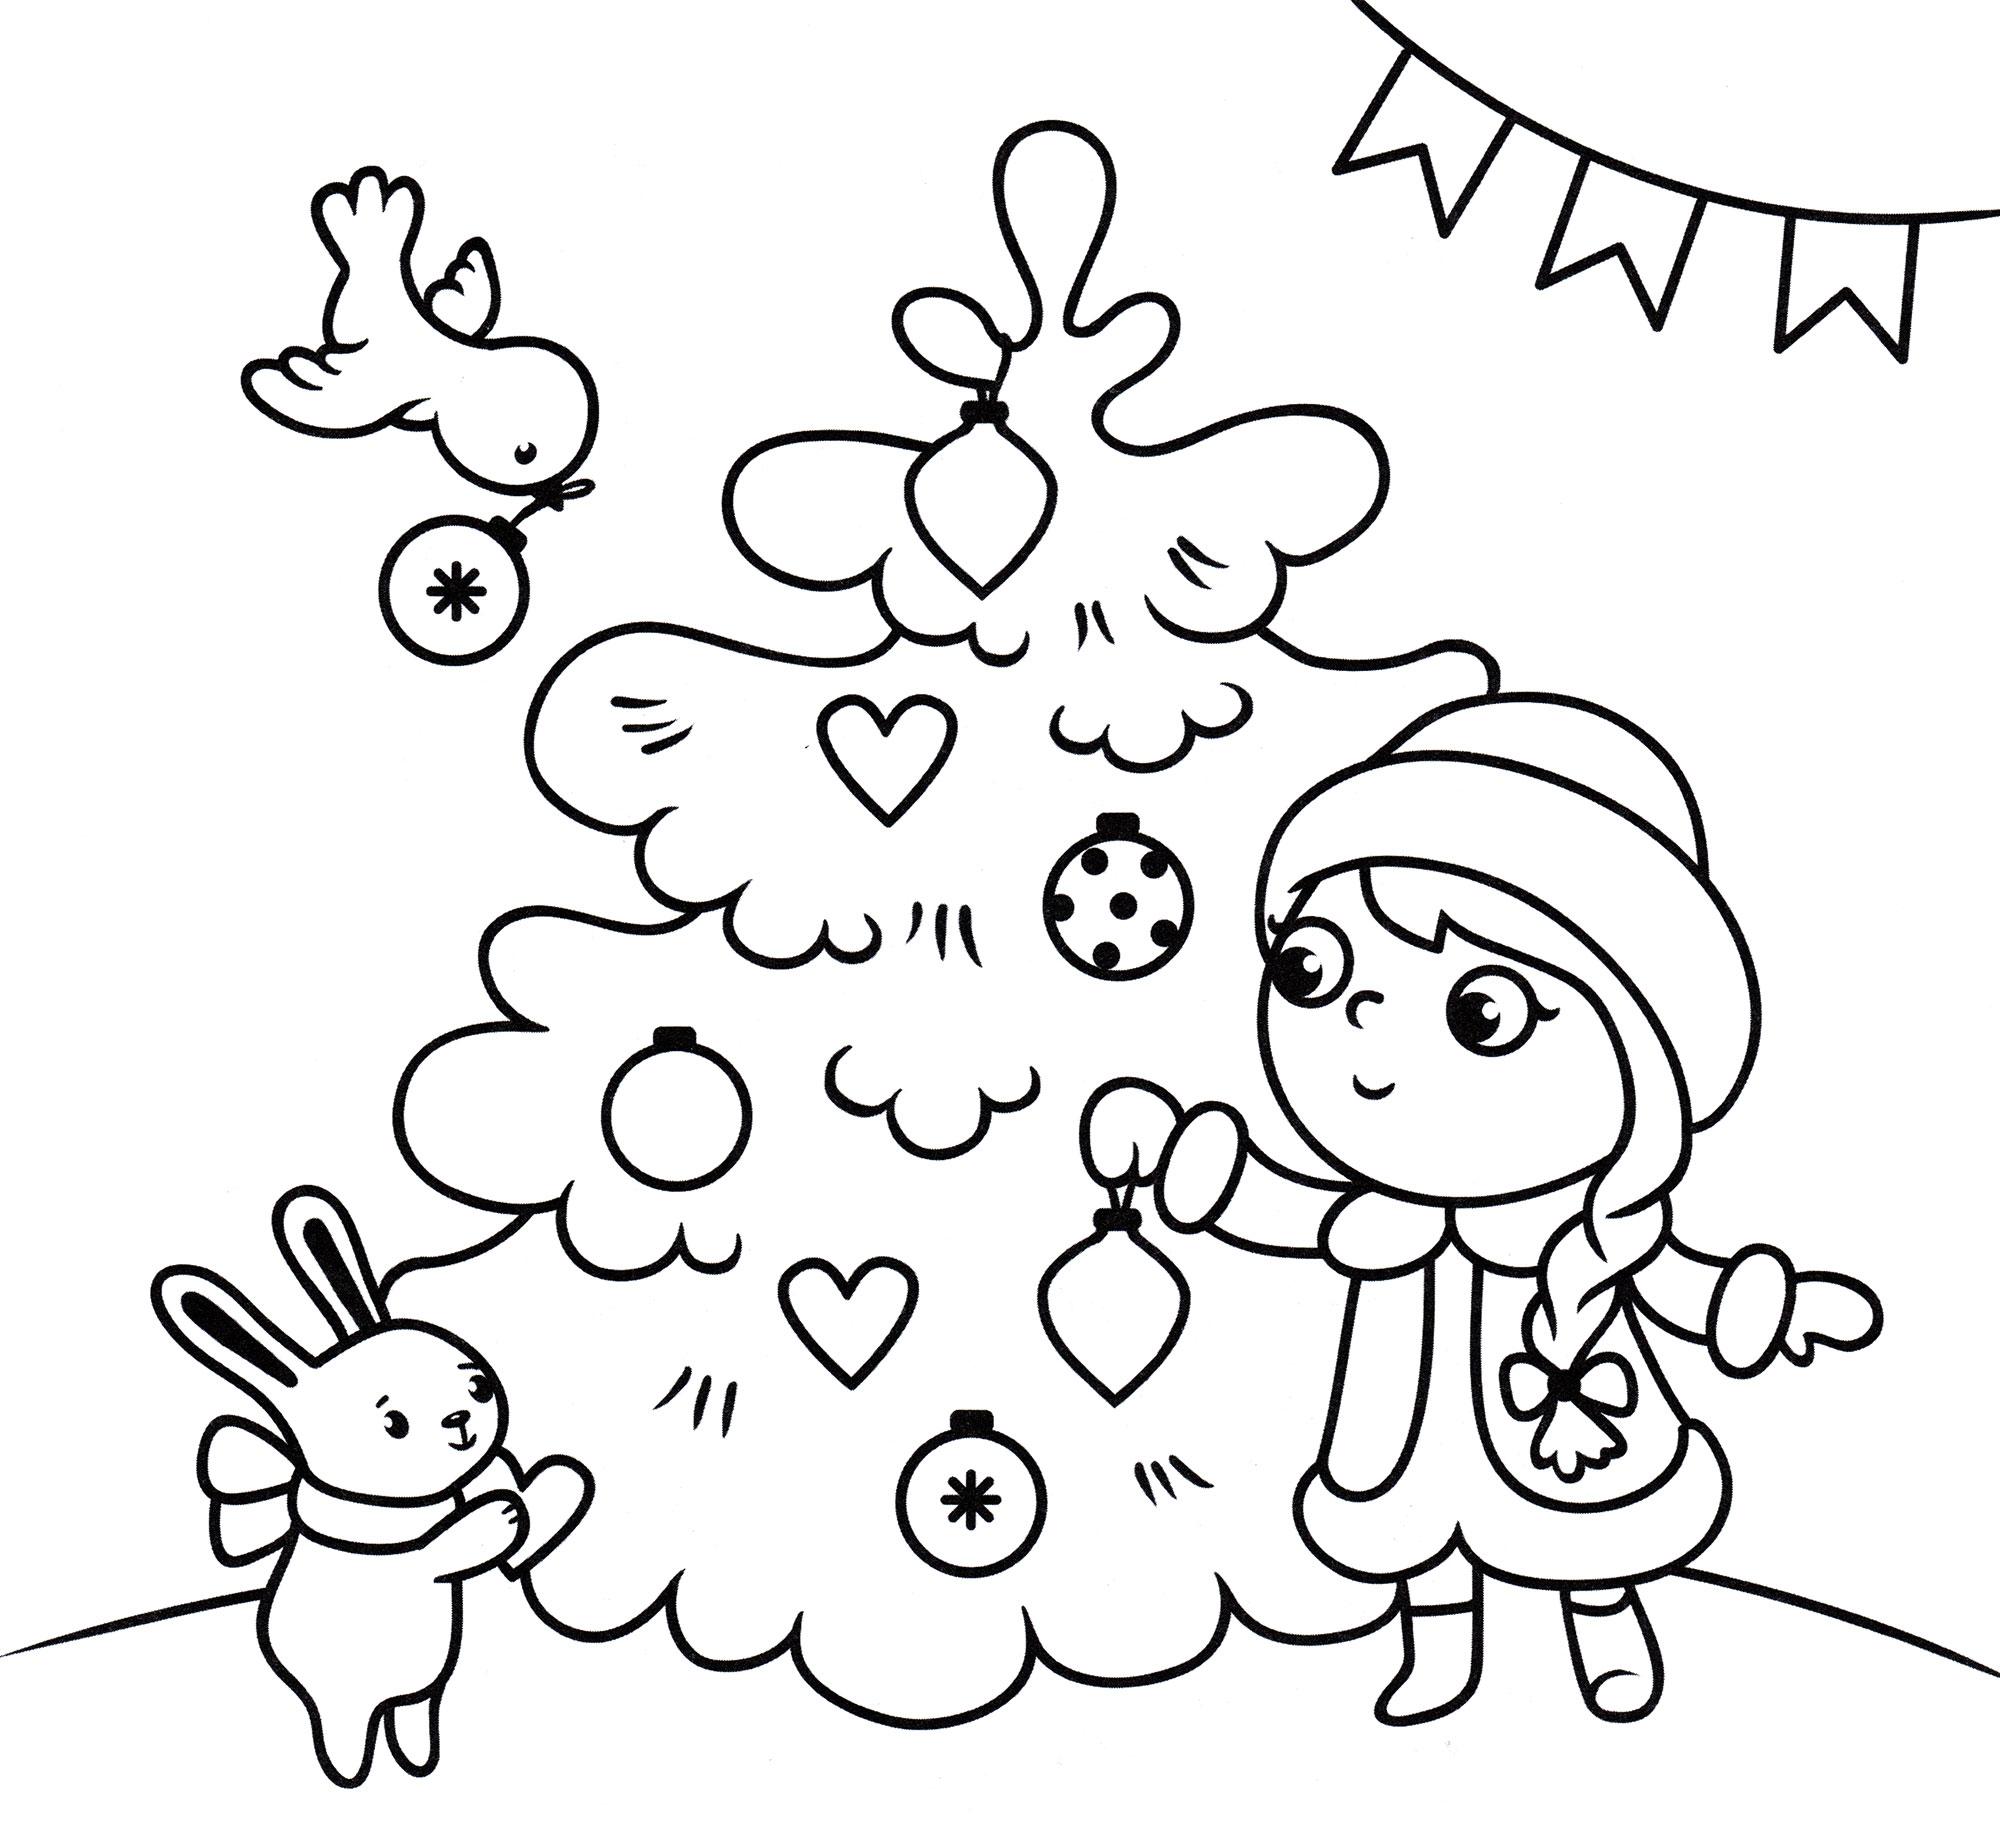 Раскраска Снегурочка украшает елку